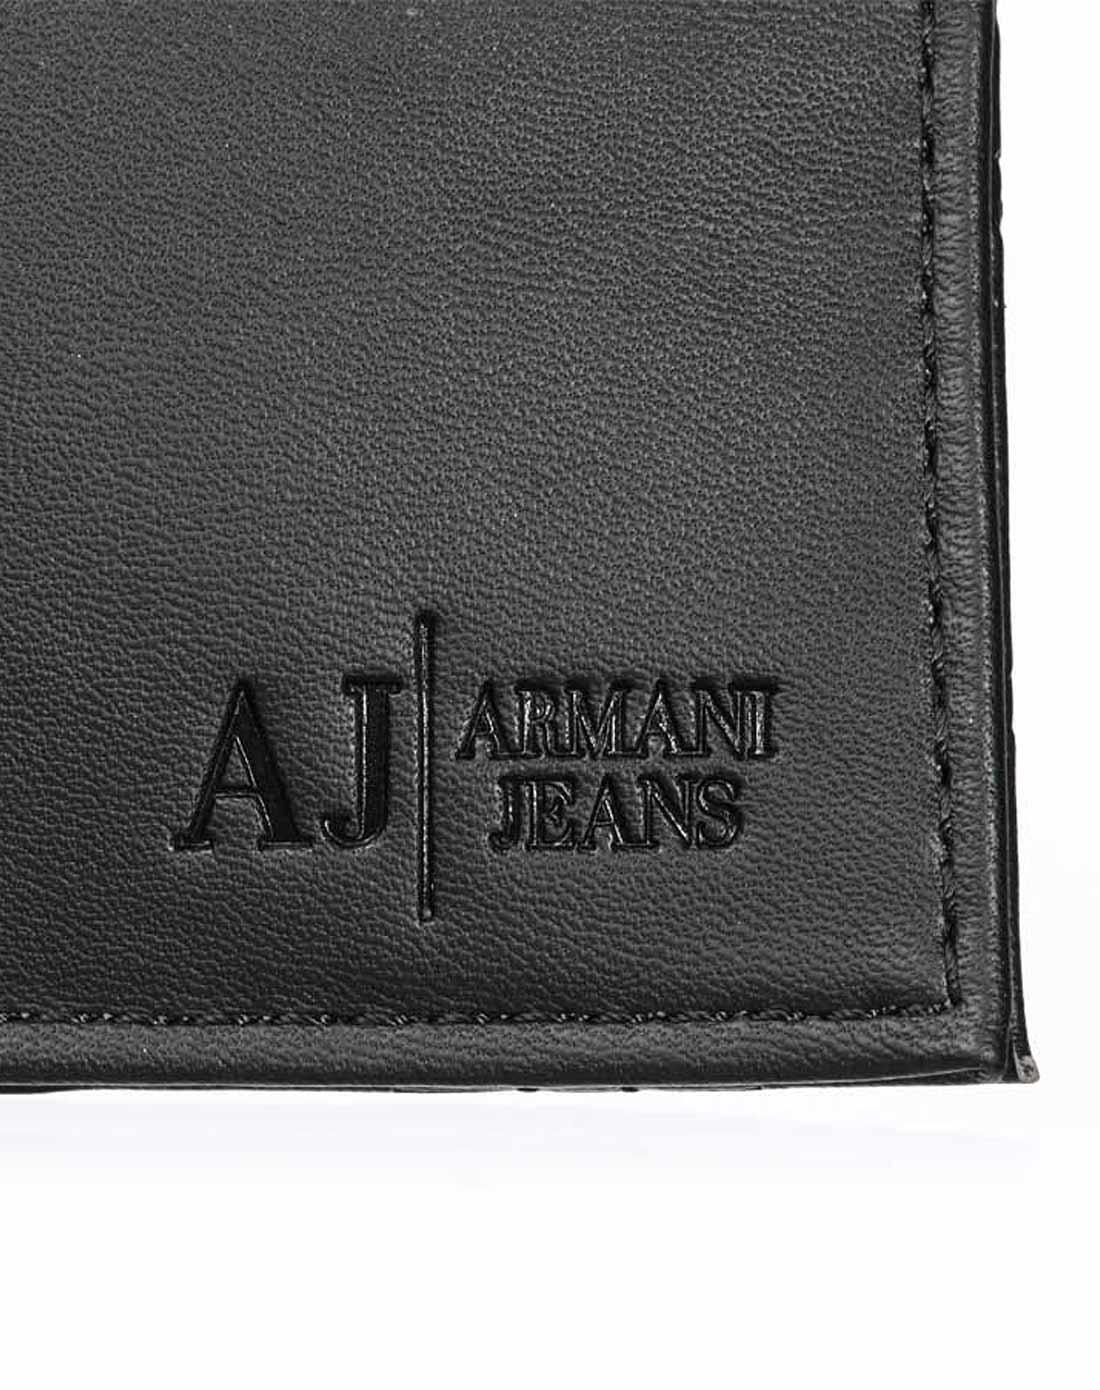 armani jeans logo压花男士钱包